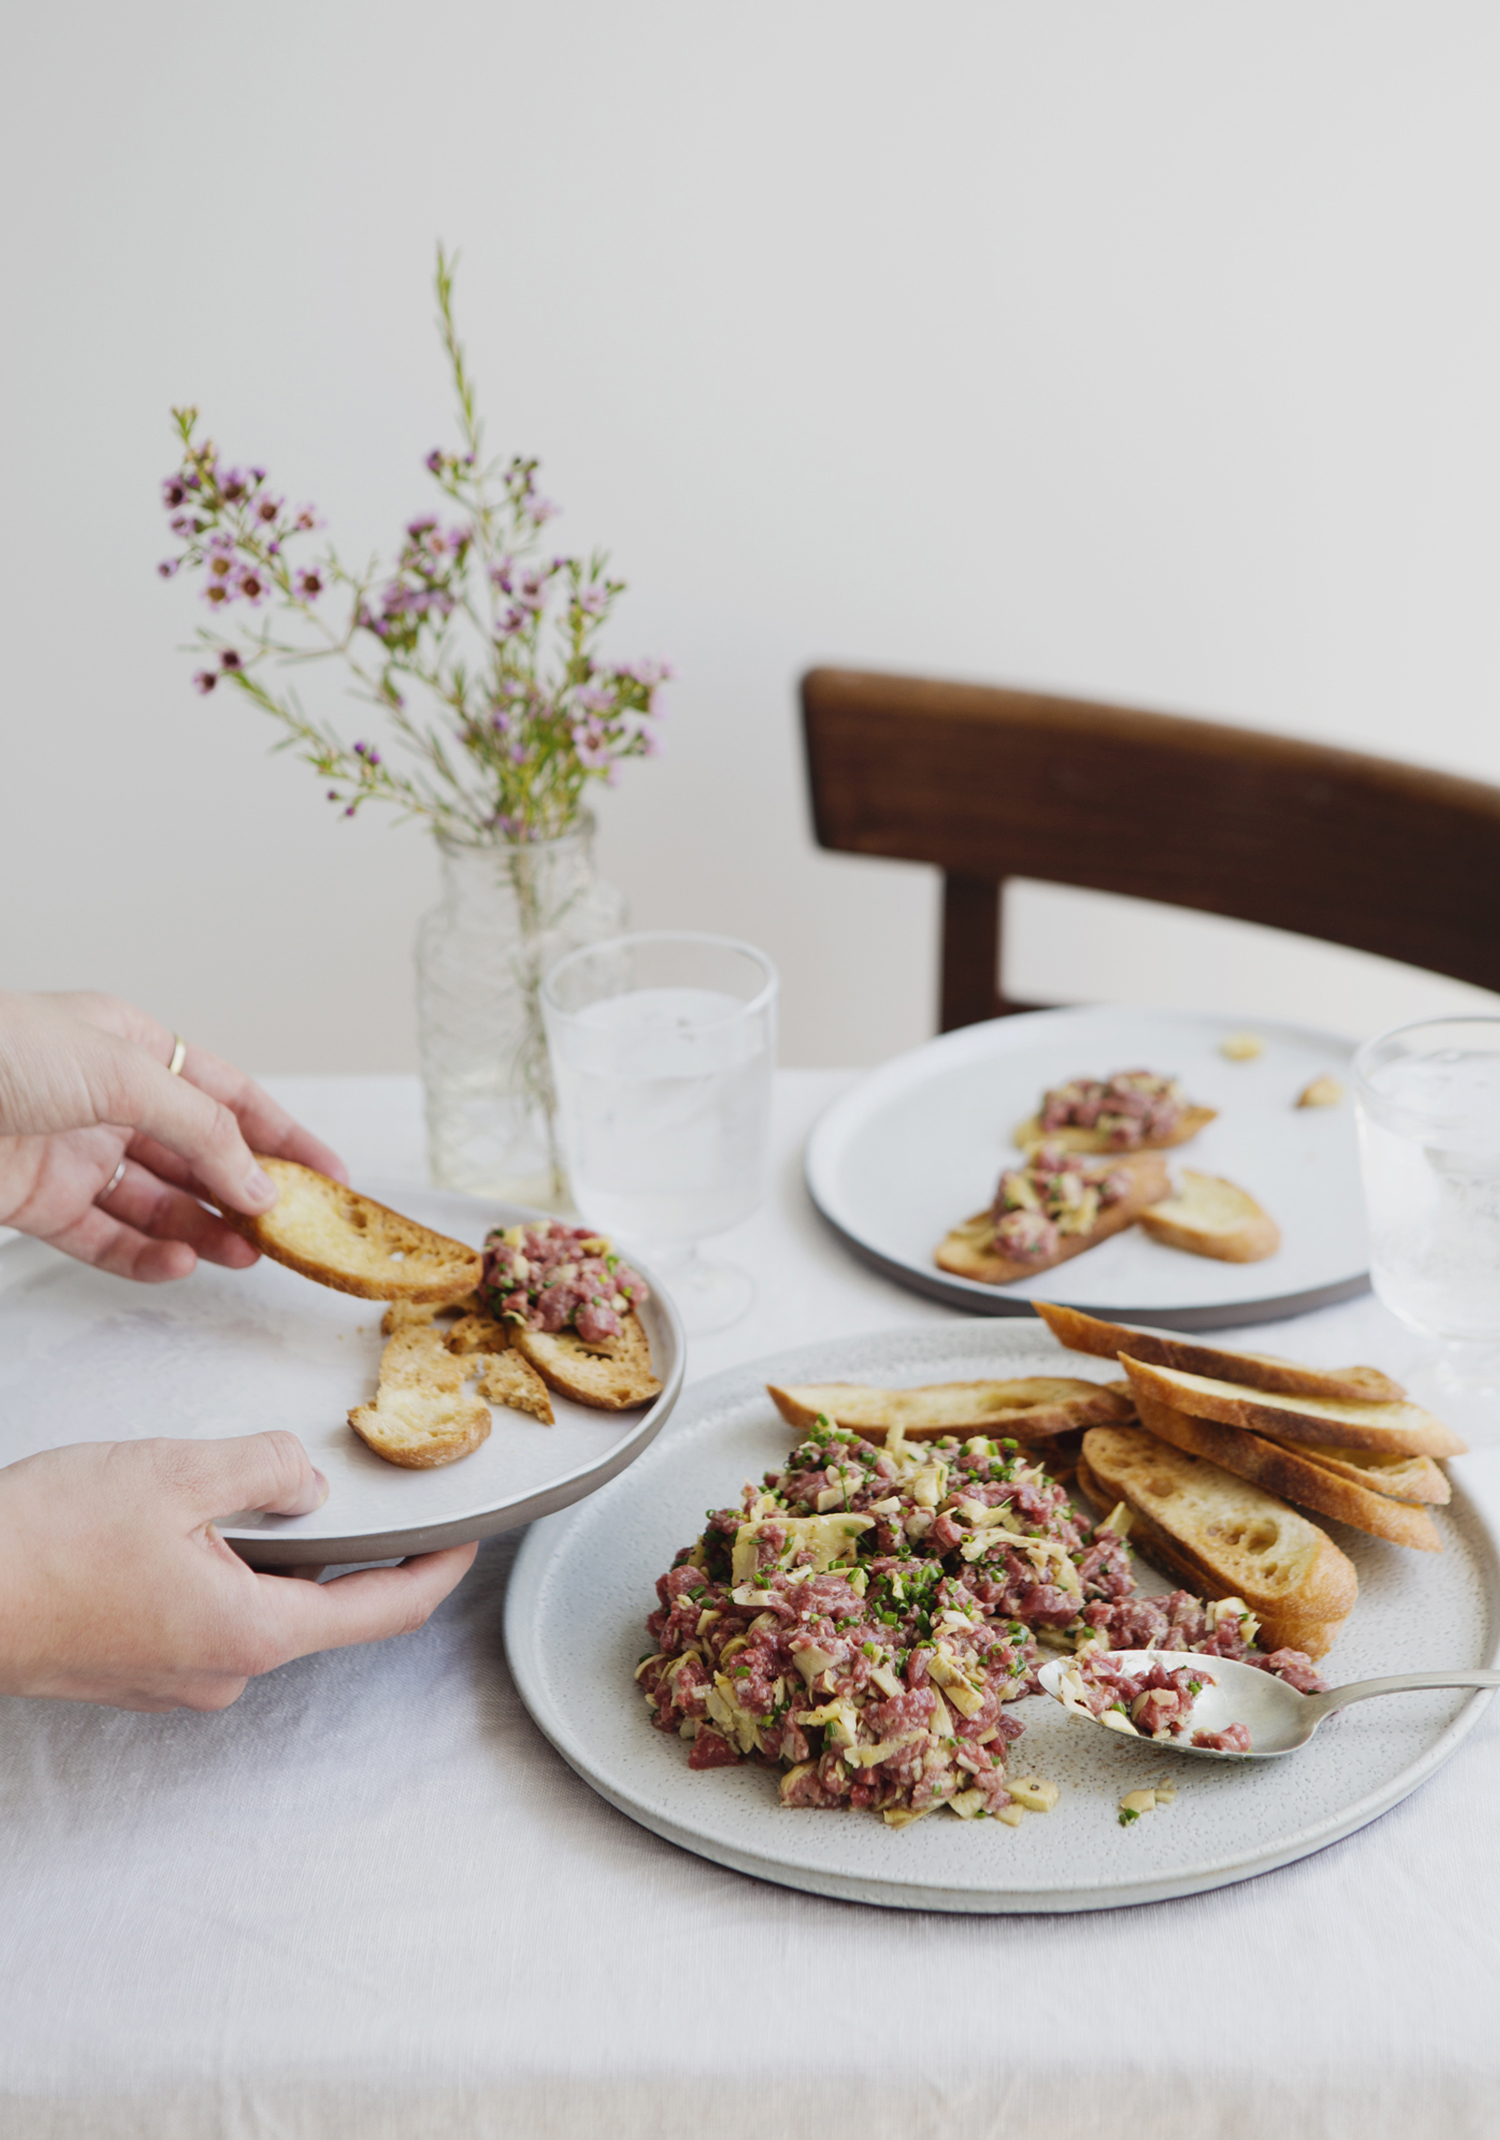 Parmesan & artichoke beef tartare